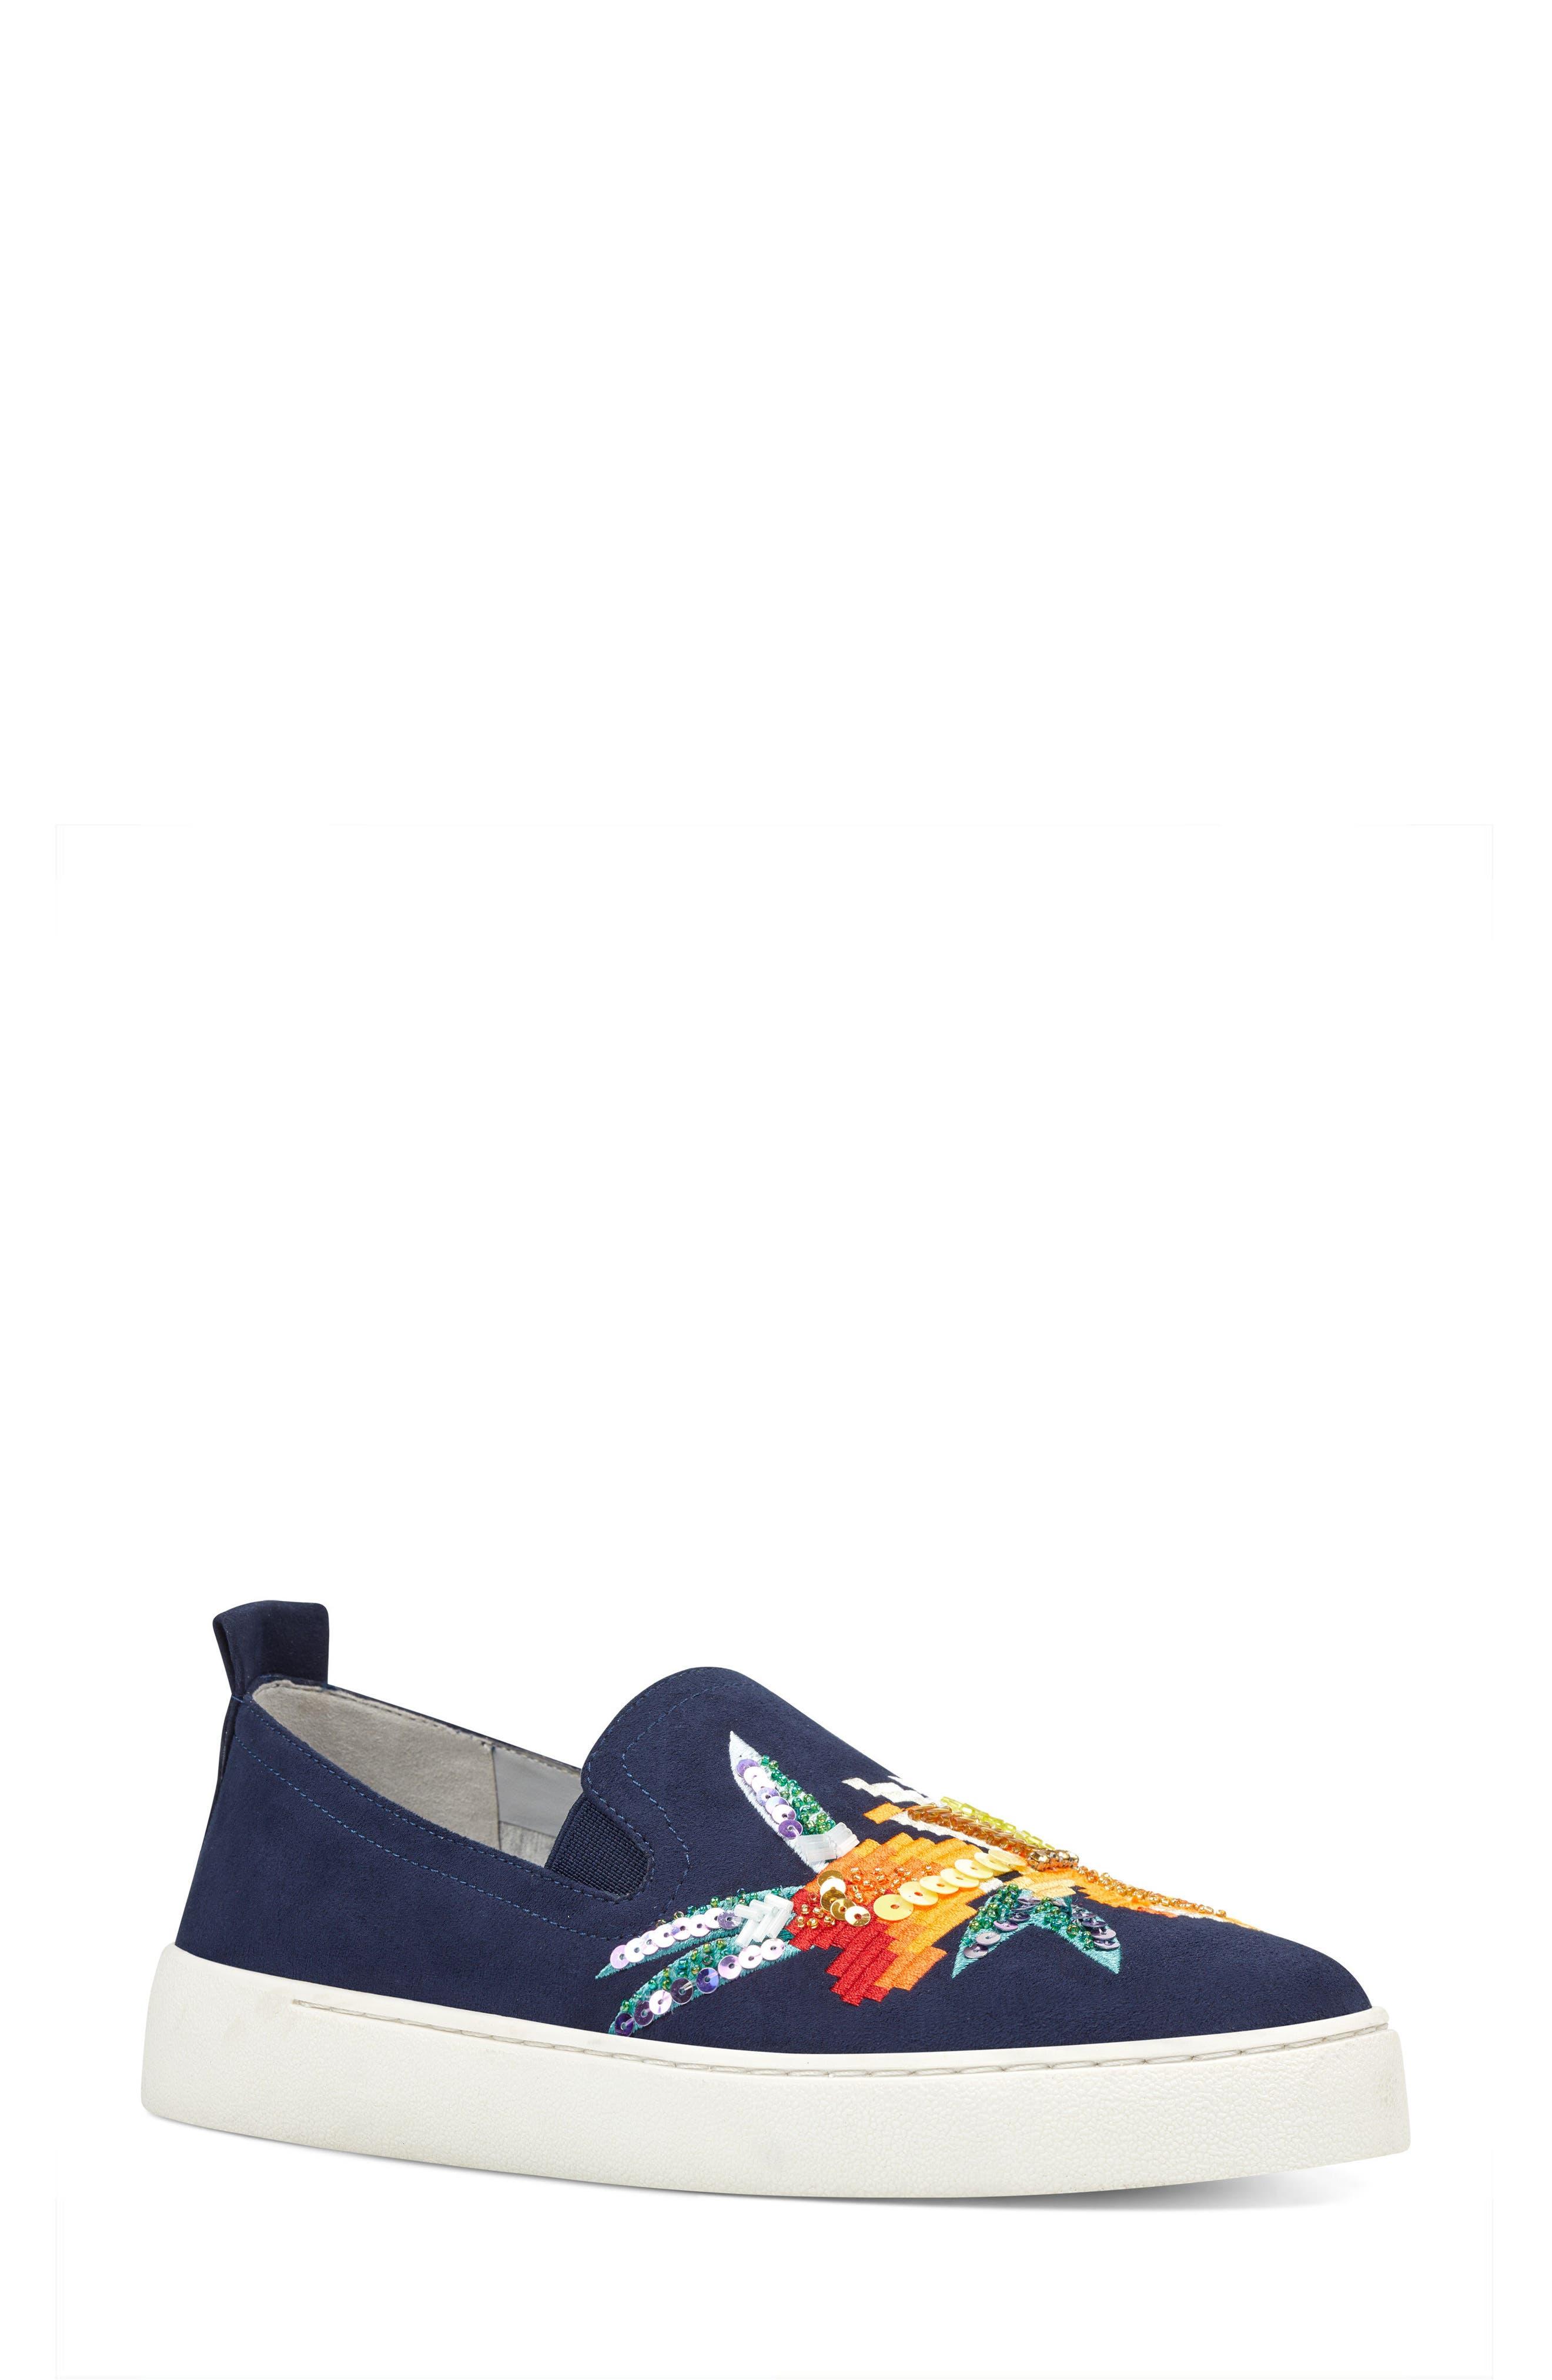 Playavista Slip-On Sneaker,                             Main thumbnail 1, color,                             Navy Suede